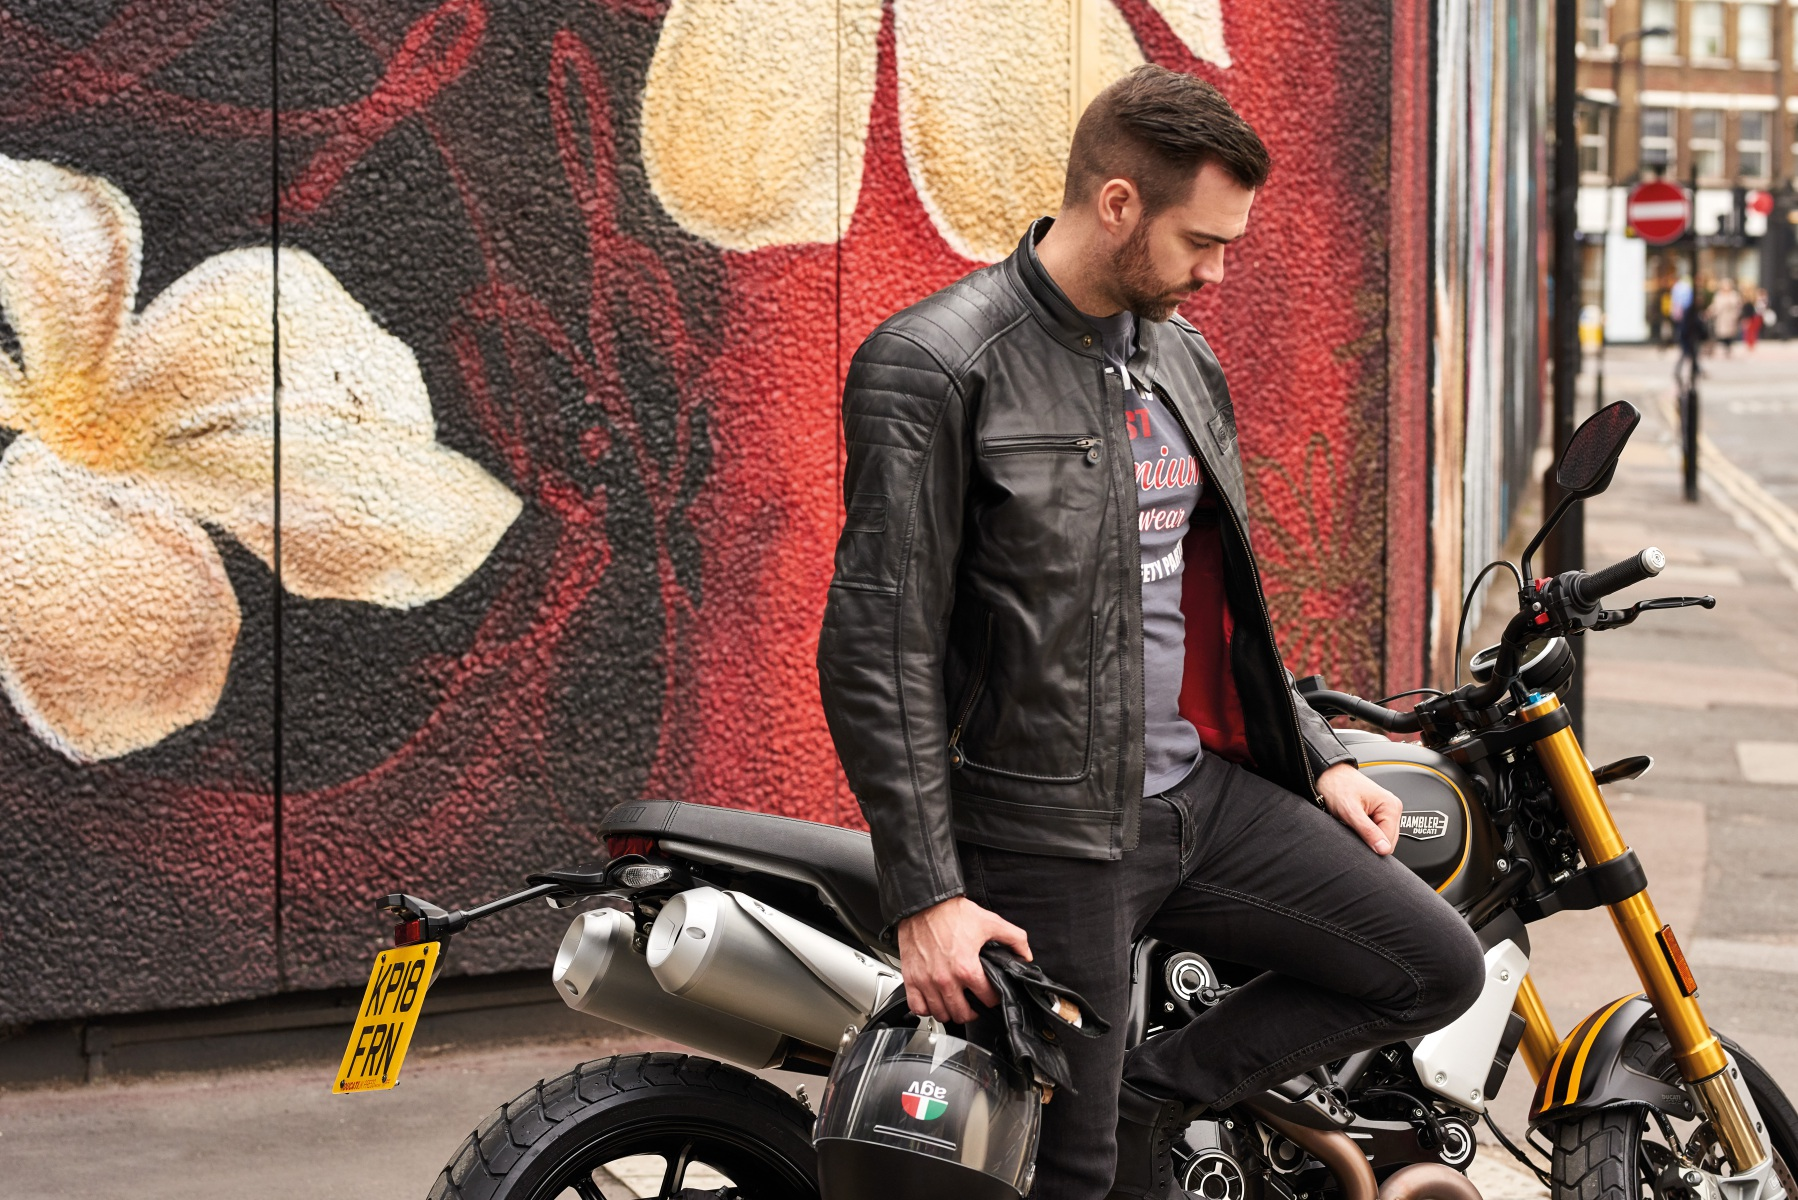 102833-rst-roadster-ii-leather-jacket-black-lifestyle-01